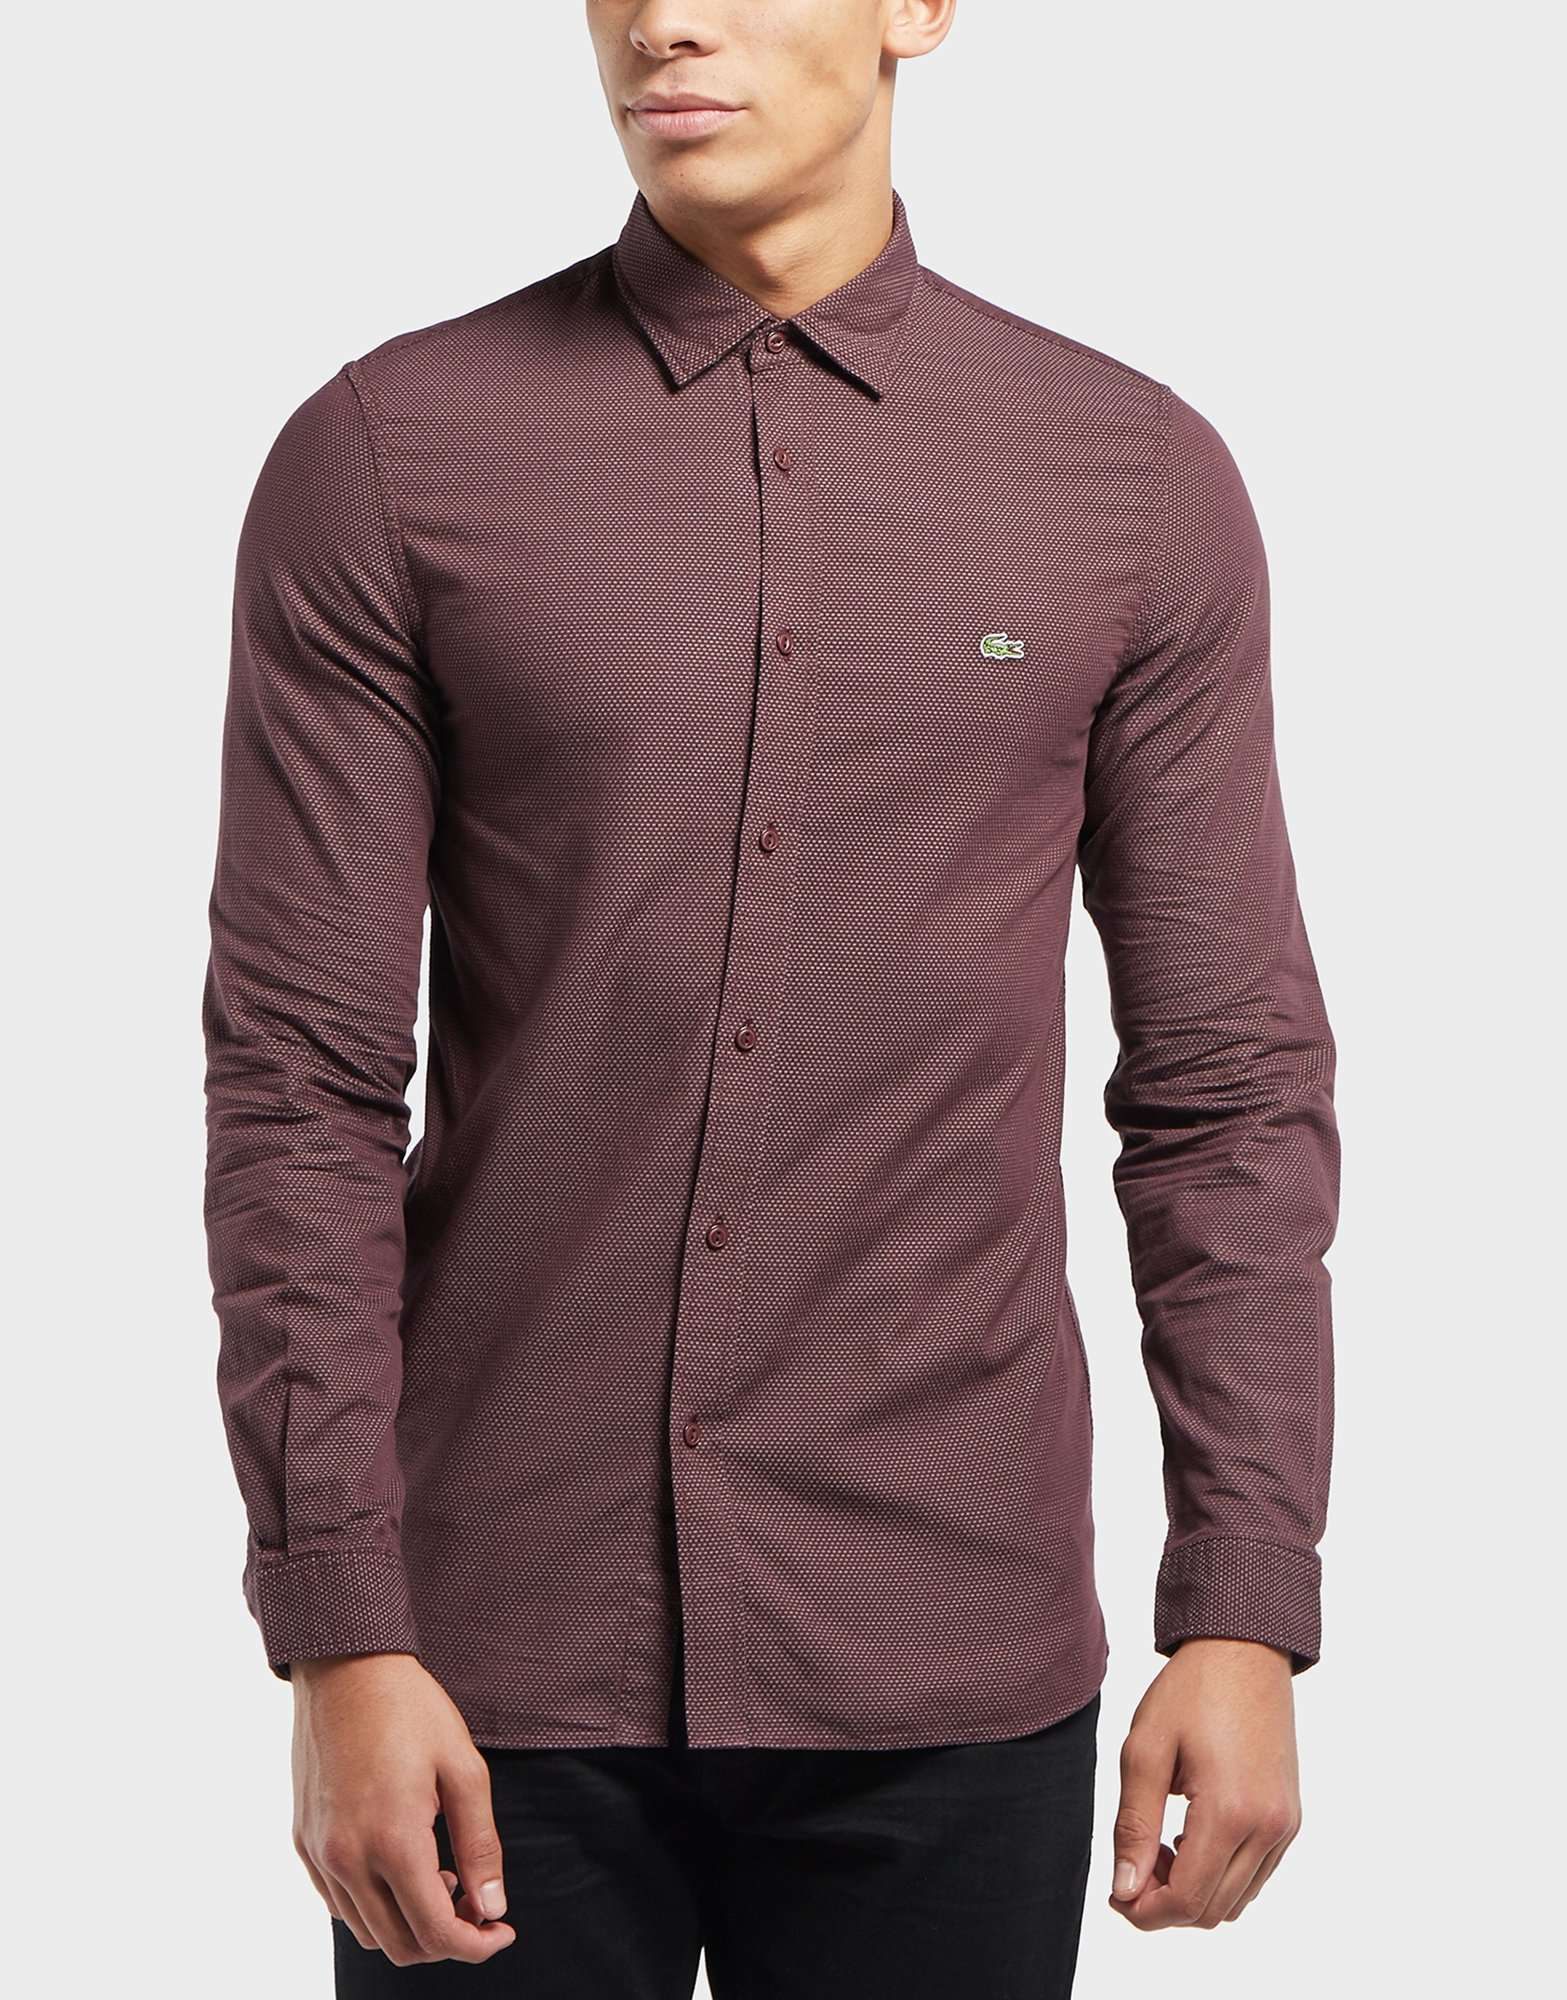 Lacoste Beye Dot Long Sleeve Shirt